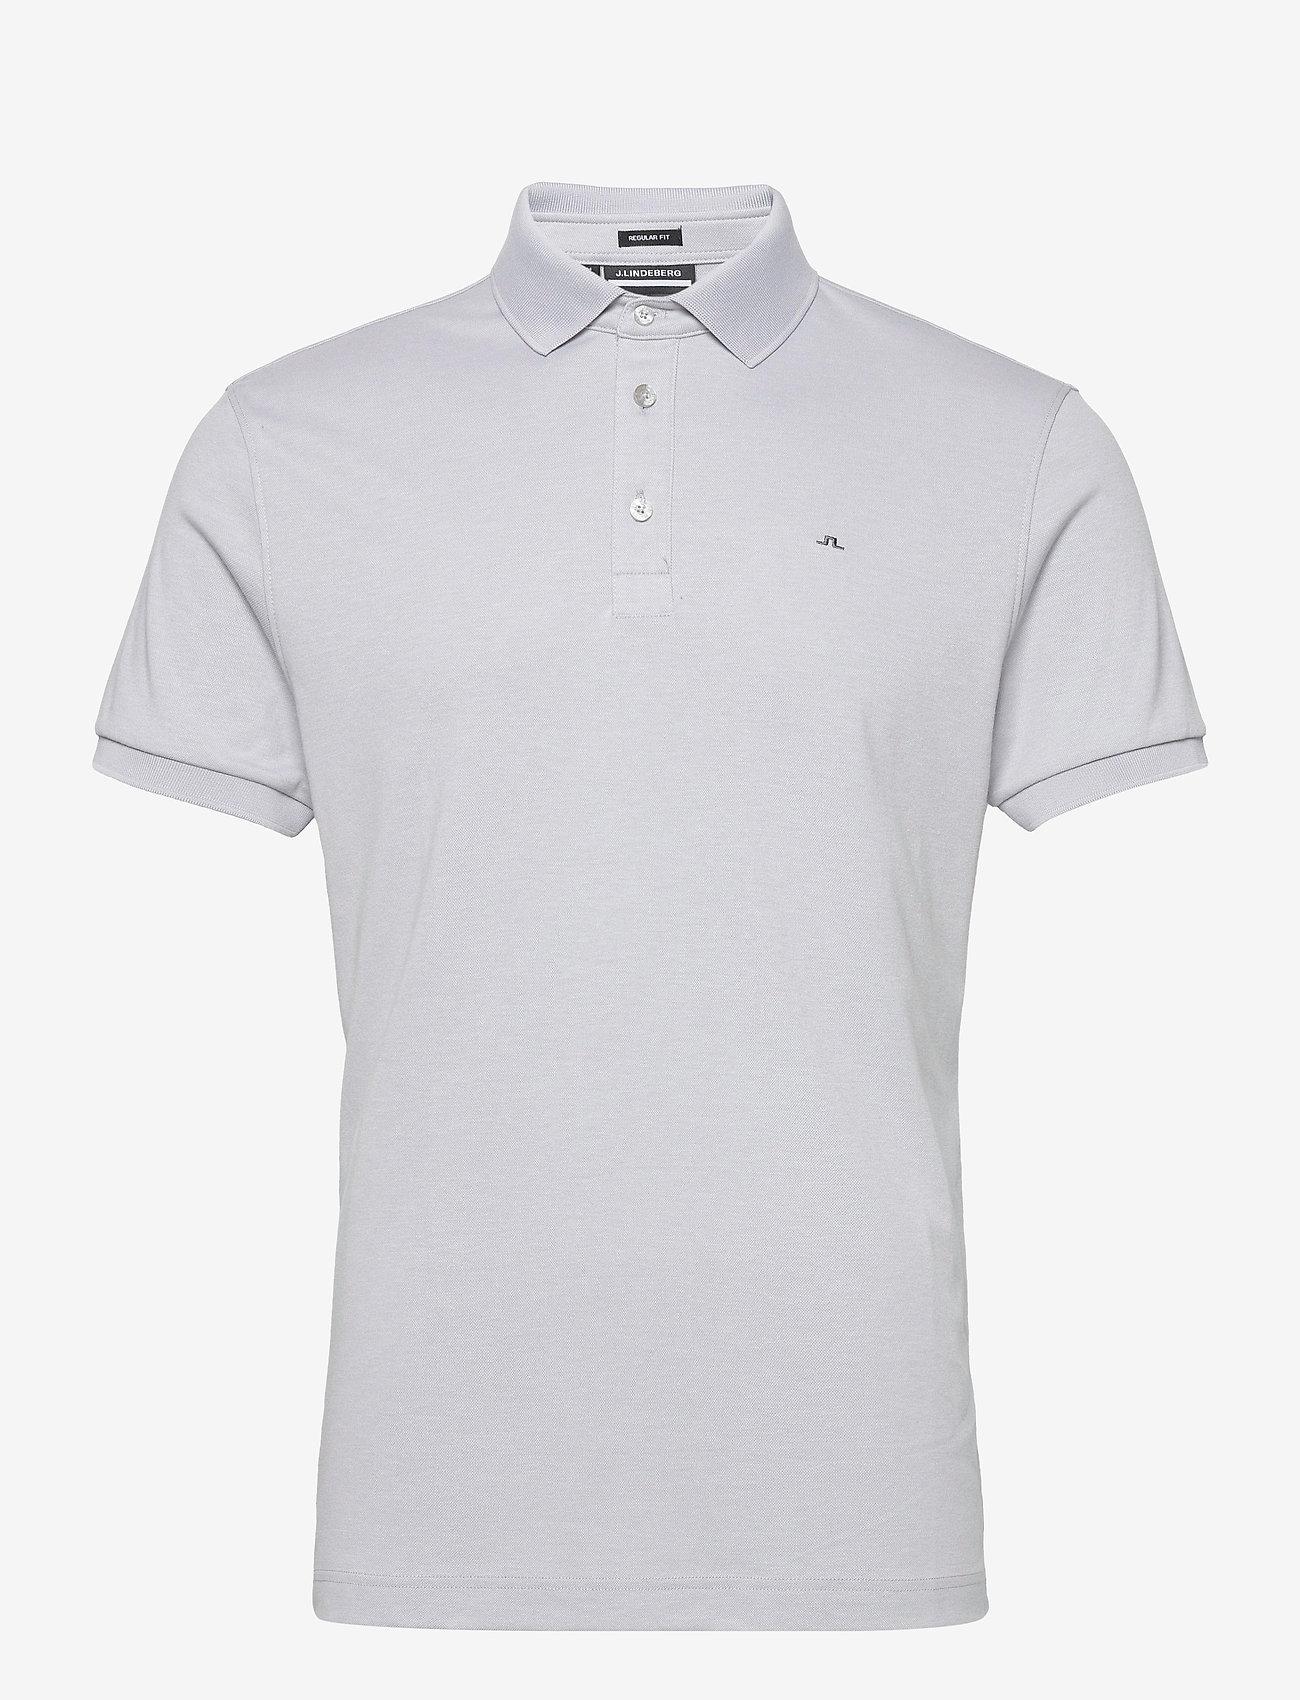 J. Lindeberg Golf - Stan Regular Fit Golf Polo - kurzärmelig - stone grey melange - 1